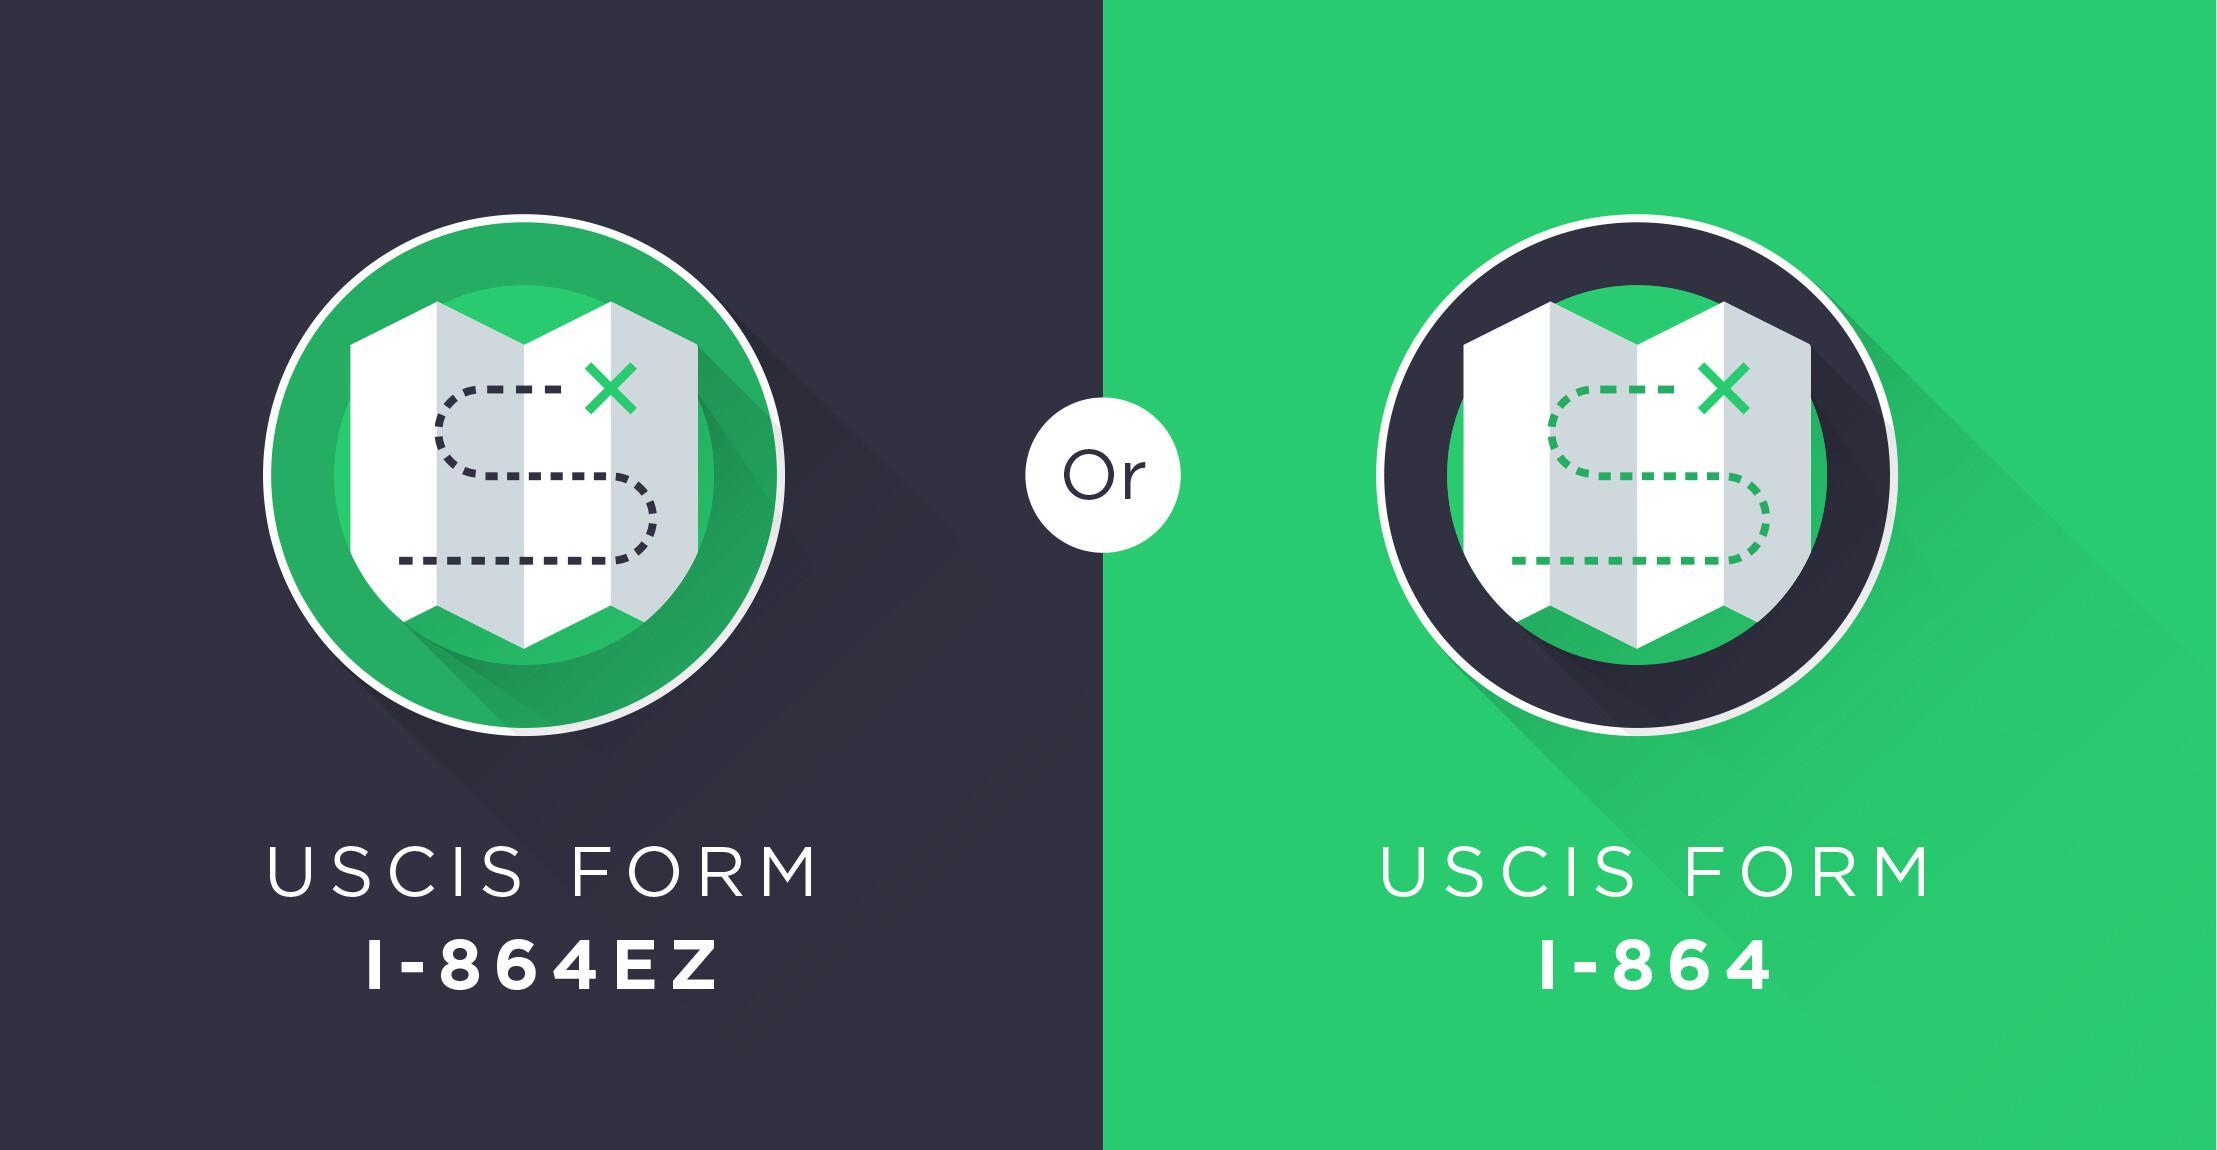 USCIS Form I-864EZ or USCIS Form I-864 Instructions